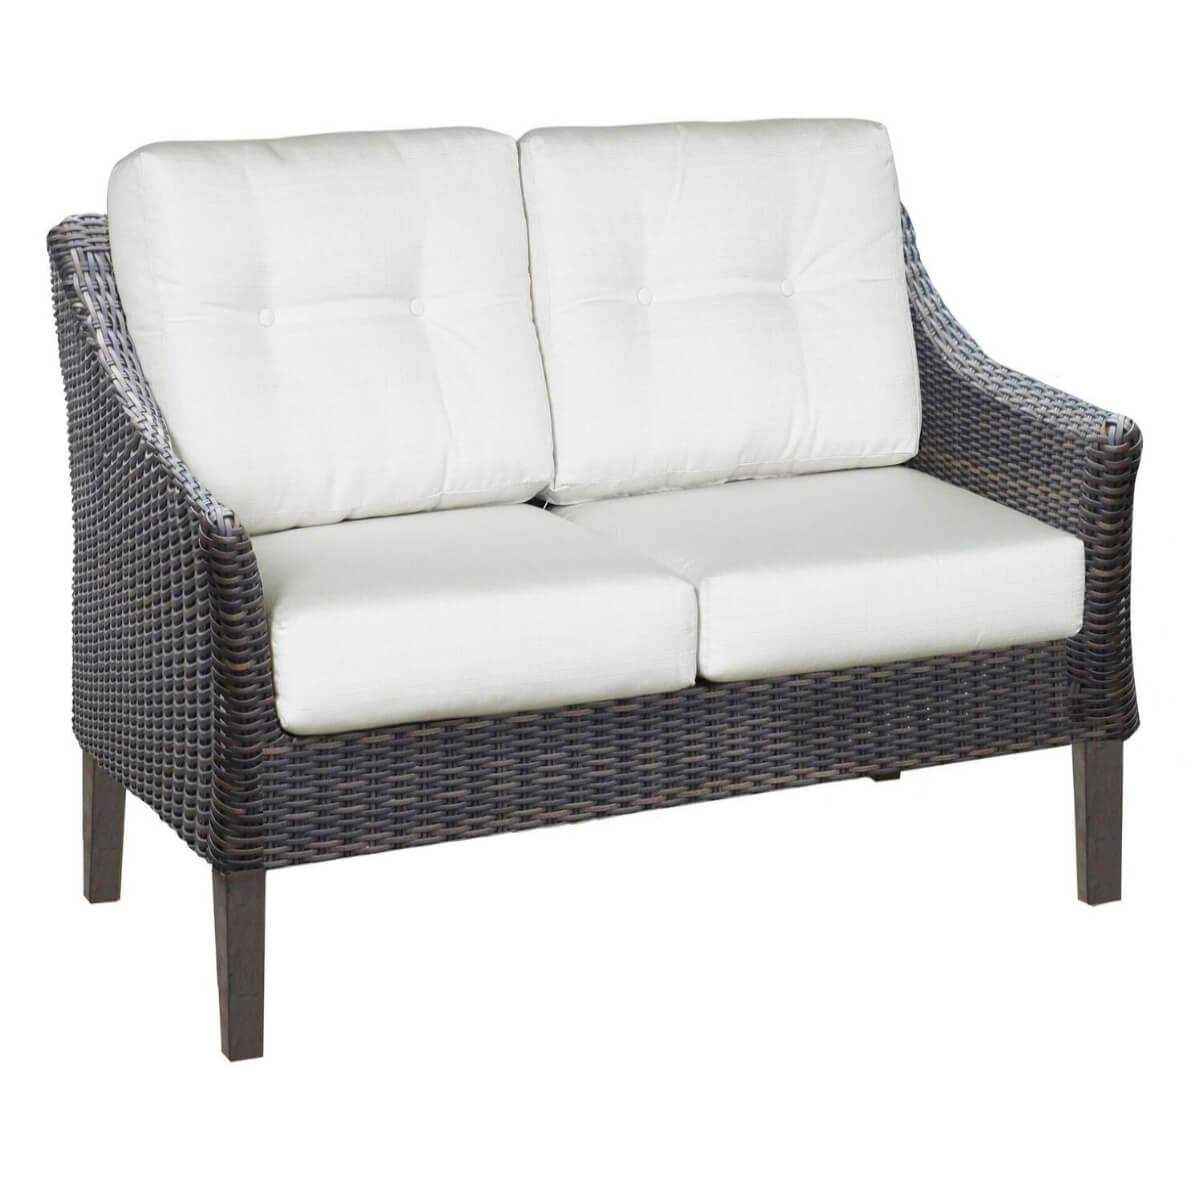 Astounding San Marino Outdoor Patio Furniture Loveseat Machost Co Dining Chair Design Ideas Machostcouk